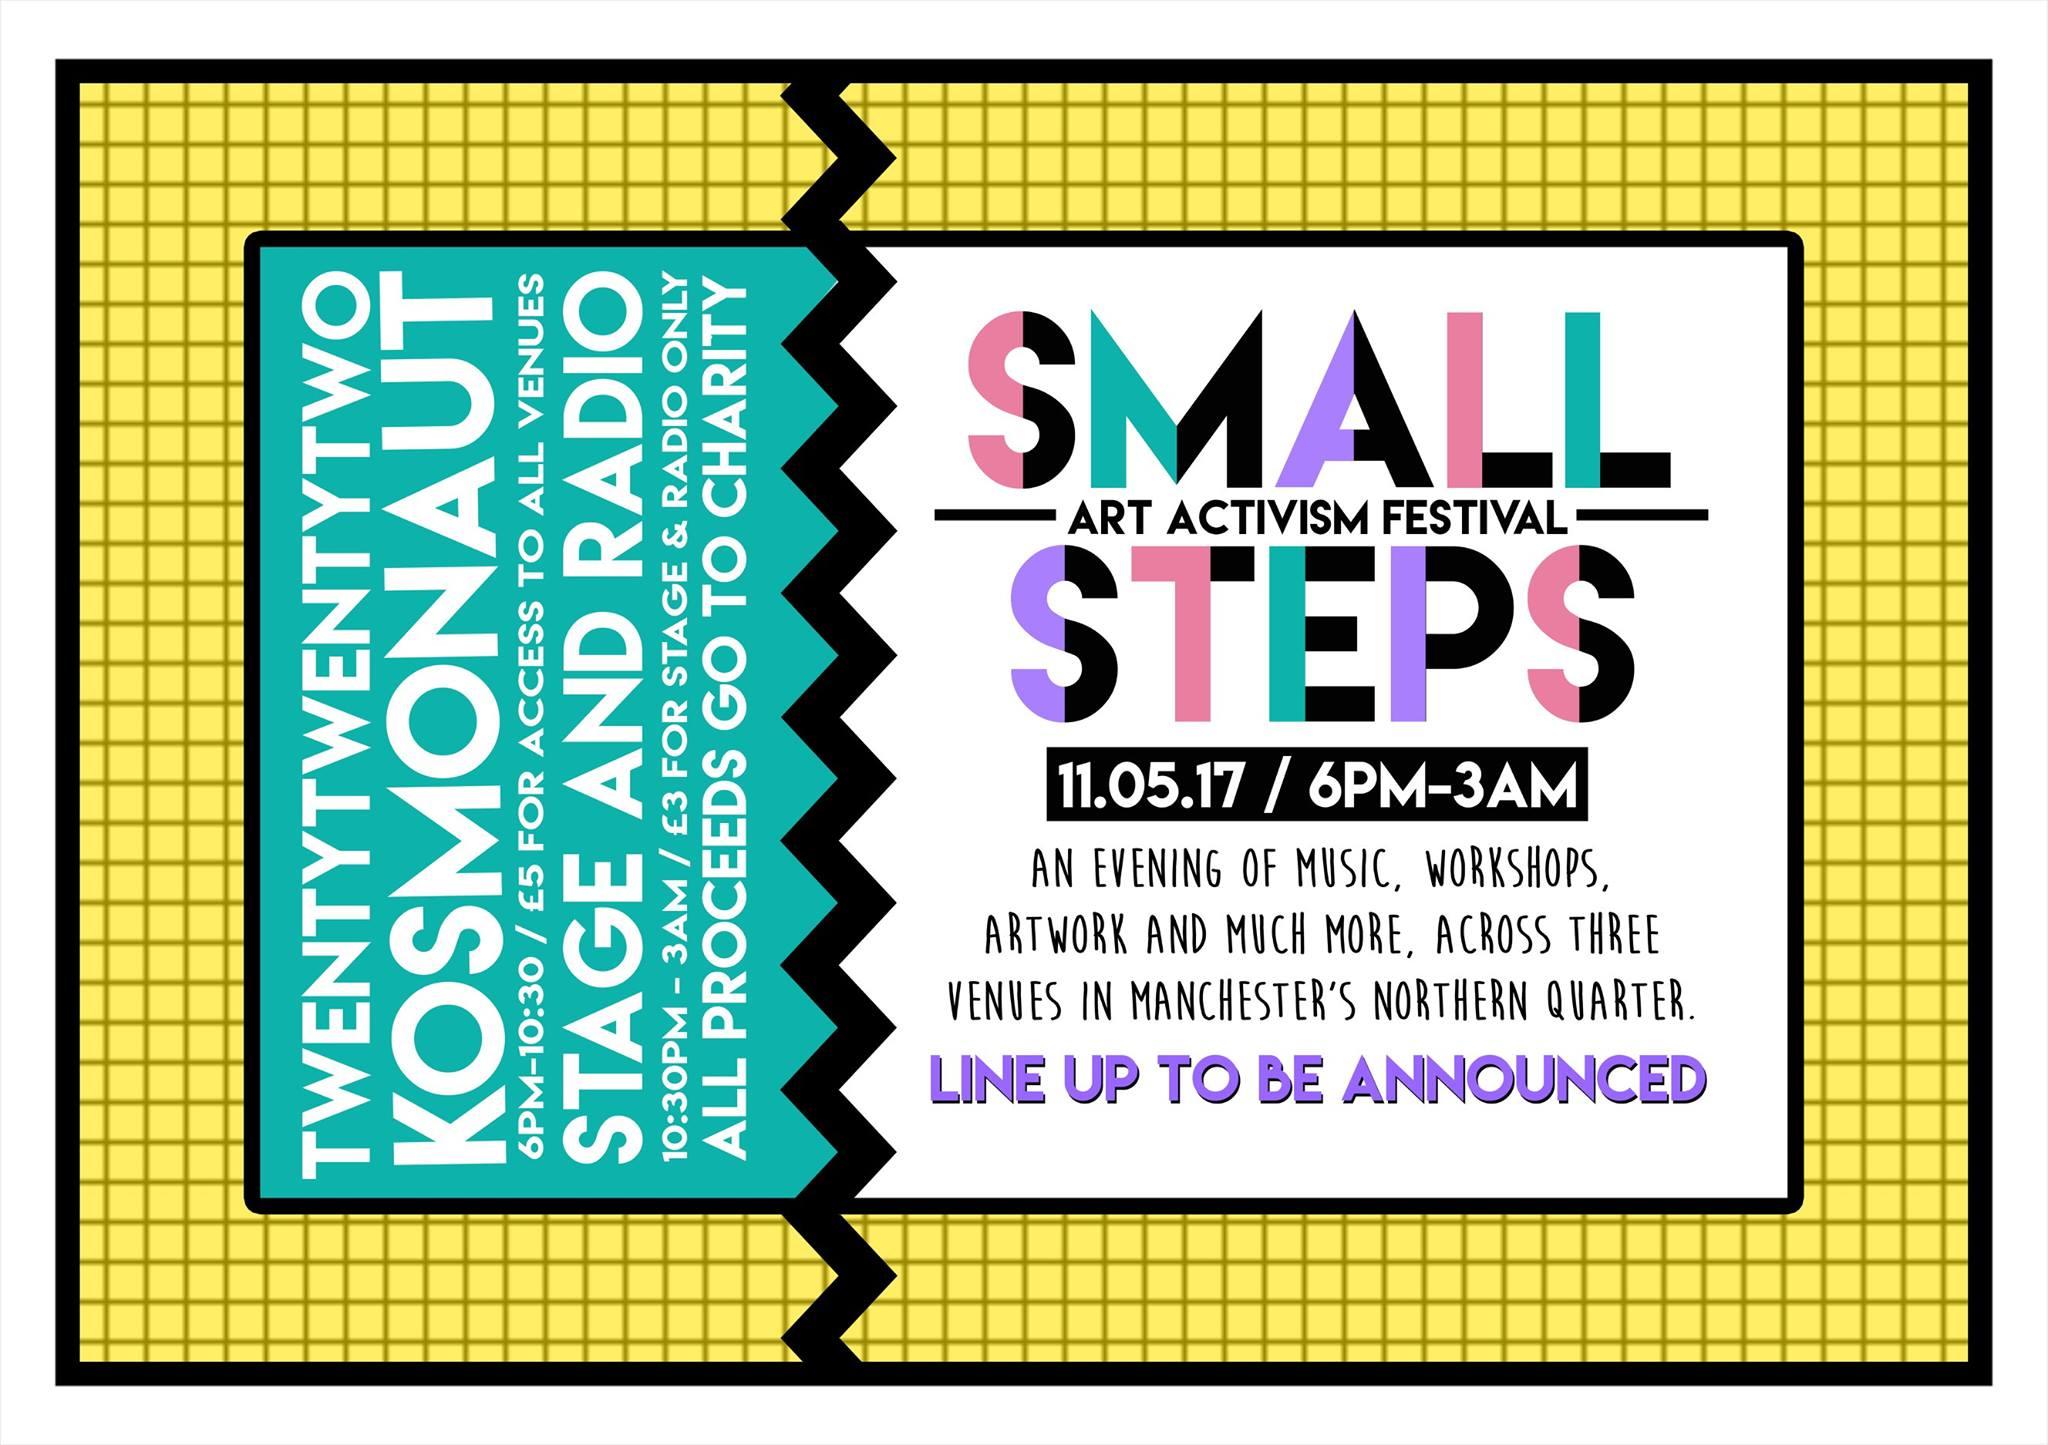 Small Steps Art Activism Festival